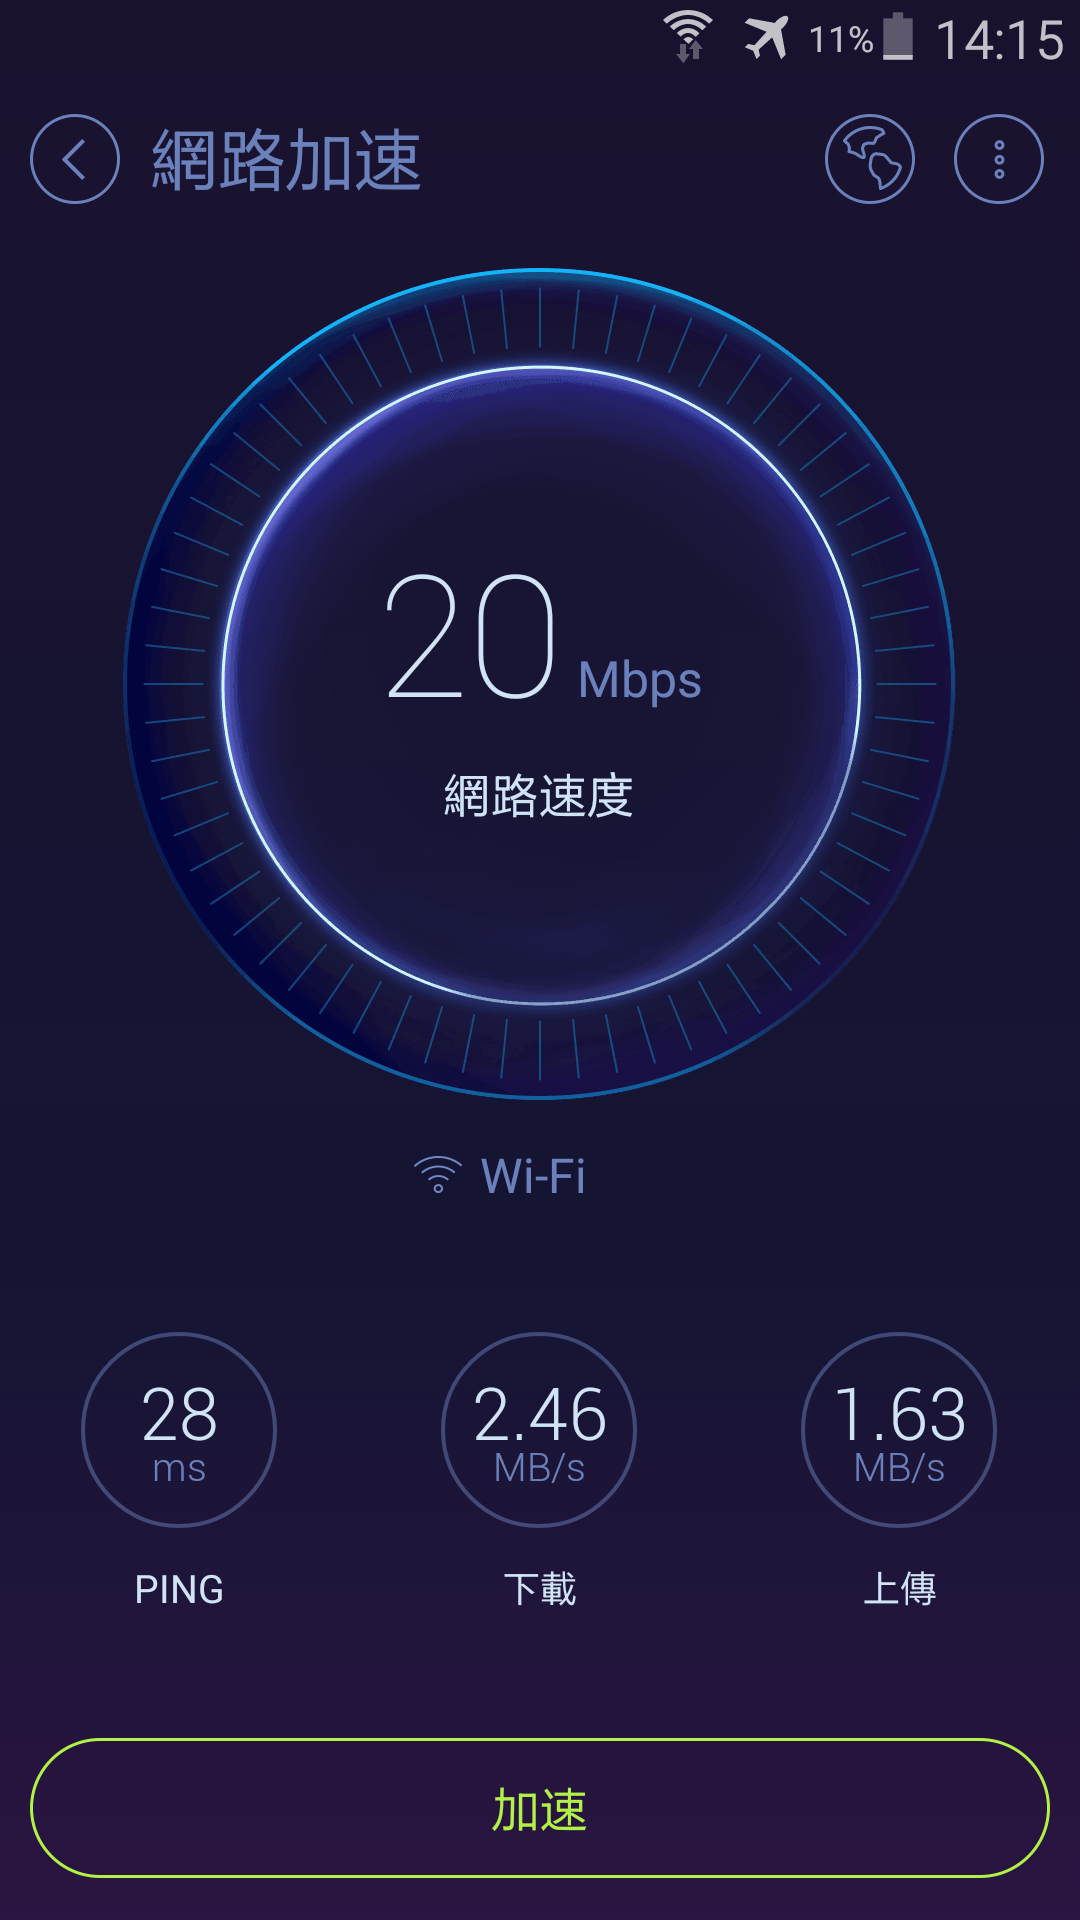 2015-12-19_九龍塘 MTR 07.png